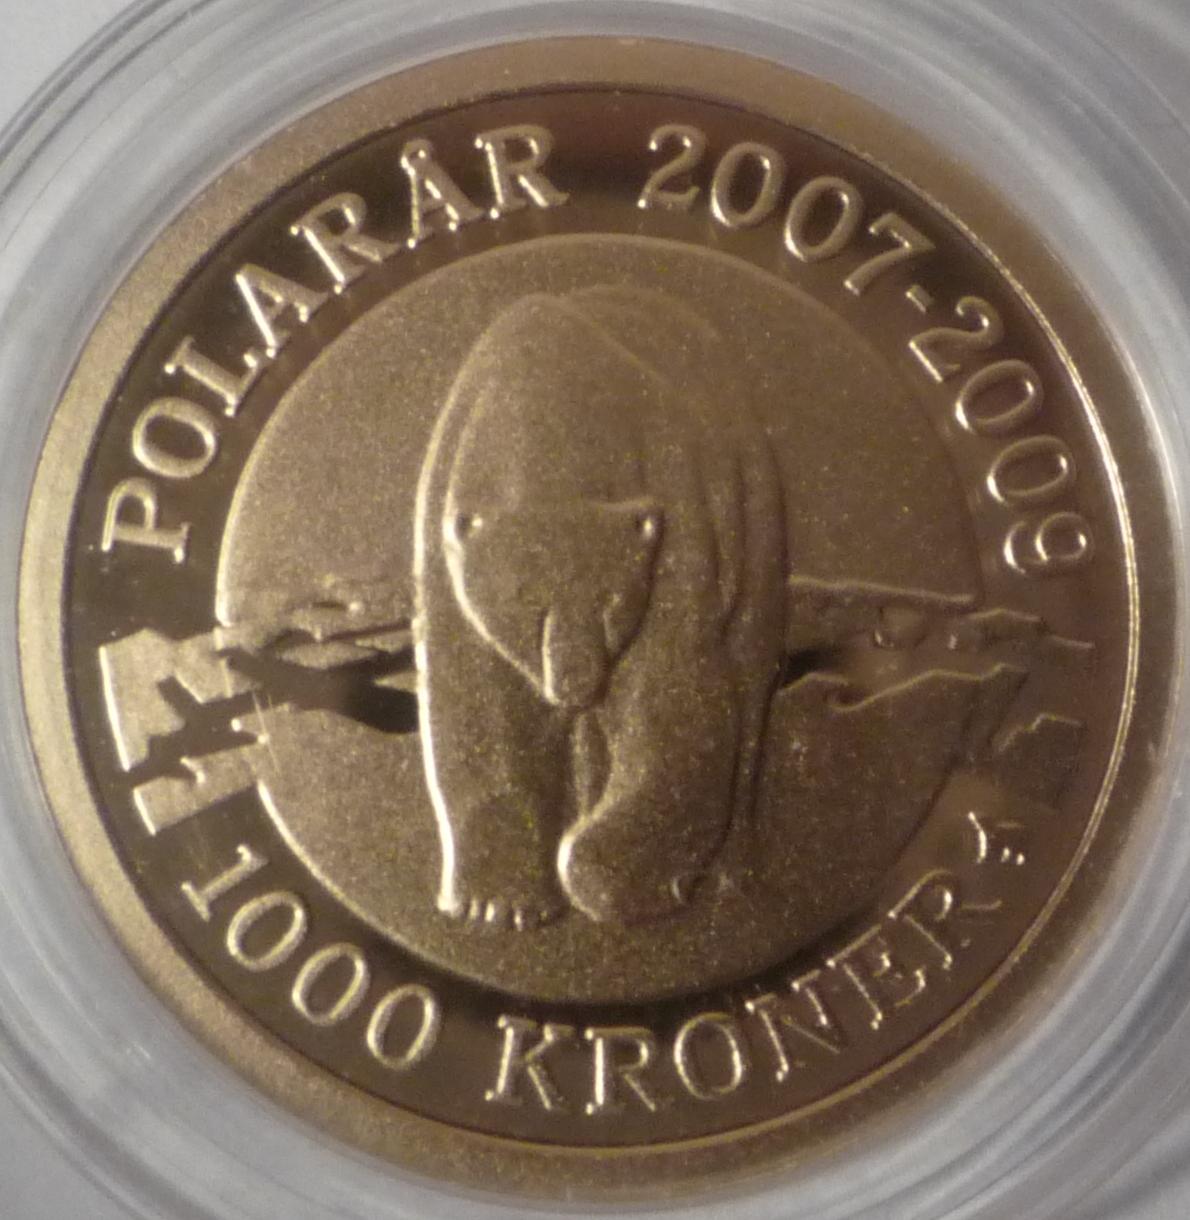 1000 Kr 2007 001.JPG